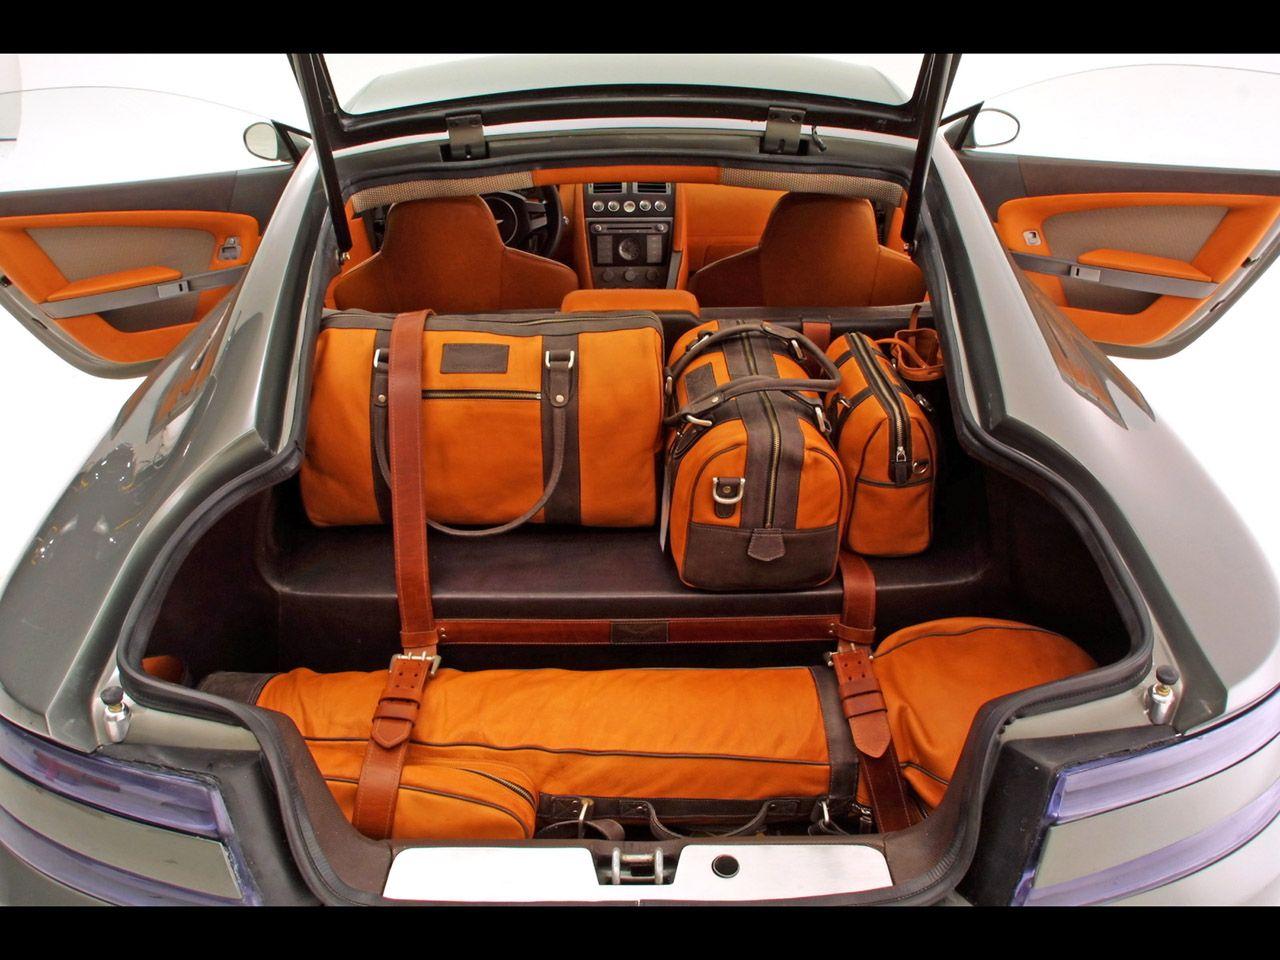 aston martin amv8 vantage am305 concept interior orange grey tan beige black door panels auto. Black Bedroom Furniture Sets. Home Design Ideas